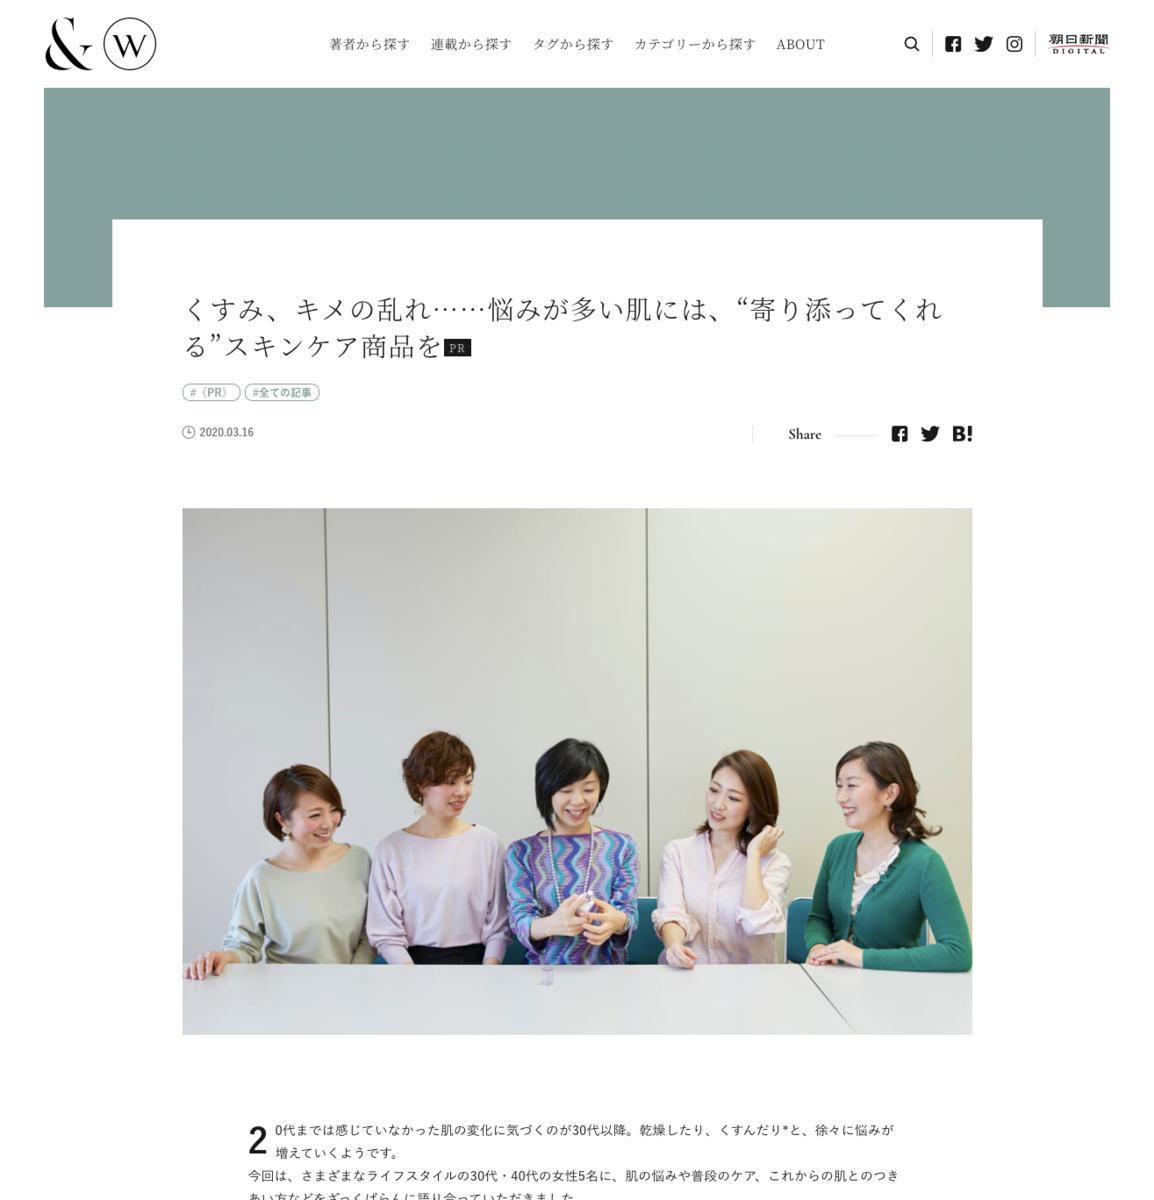 f:id:naoko-moriyama:20200316140050p:plain